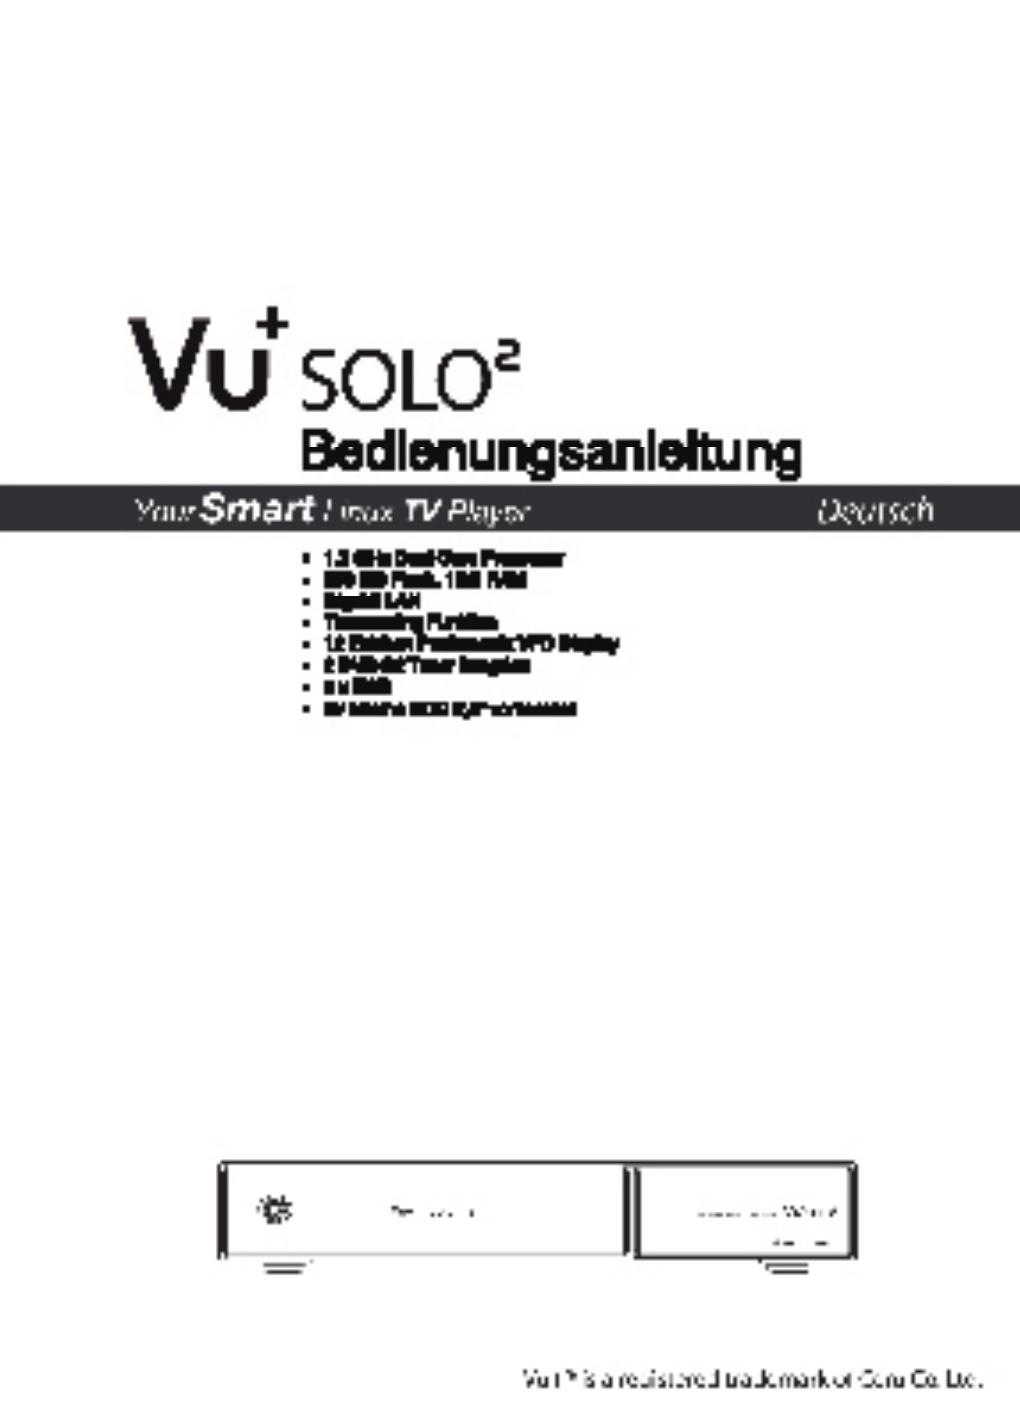 vu solo2 bedienungsanleitung